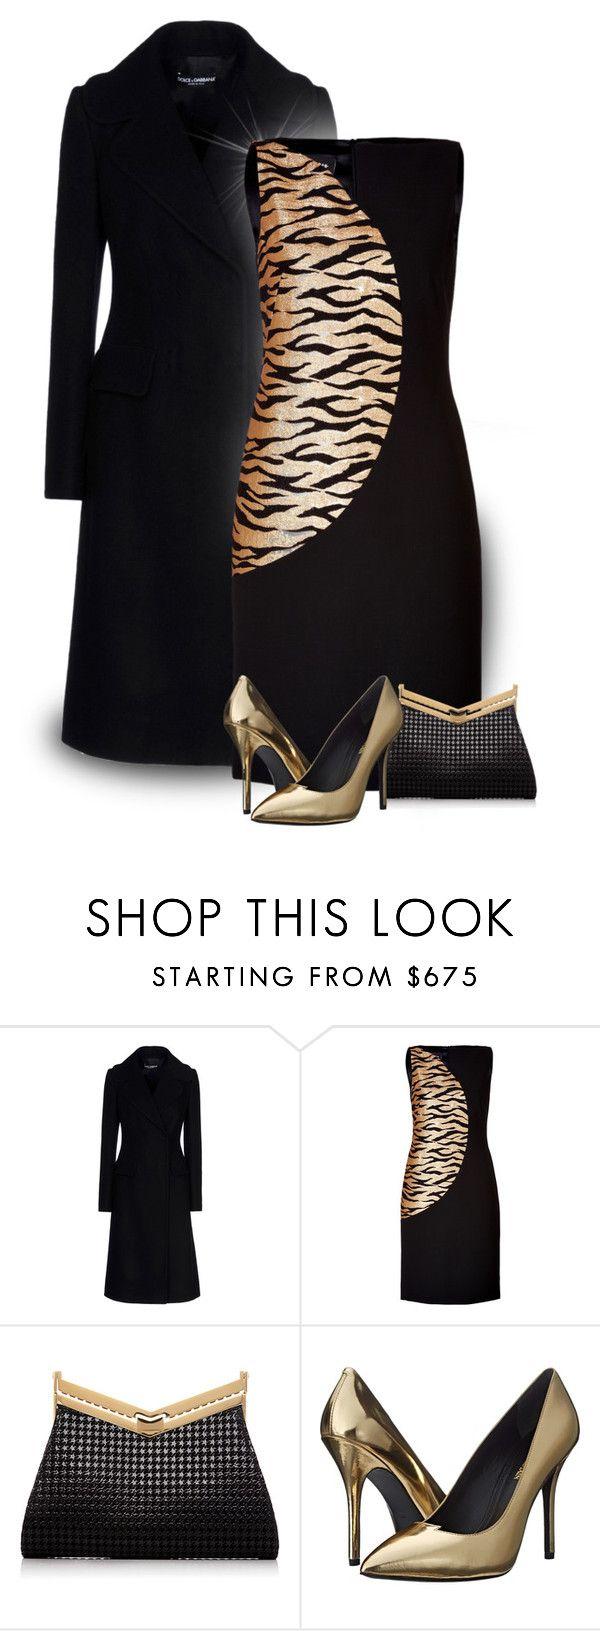 """Black & Gold"" by johannahoj ❤ liked on Polyvore featuring Dolce&Gabbana, Akris, J. Mendel and Pierre Balmain"